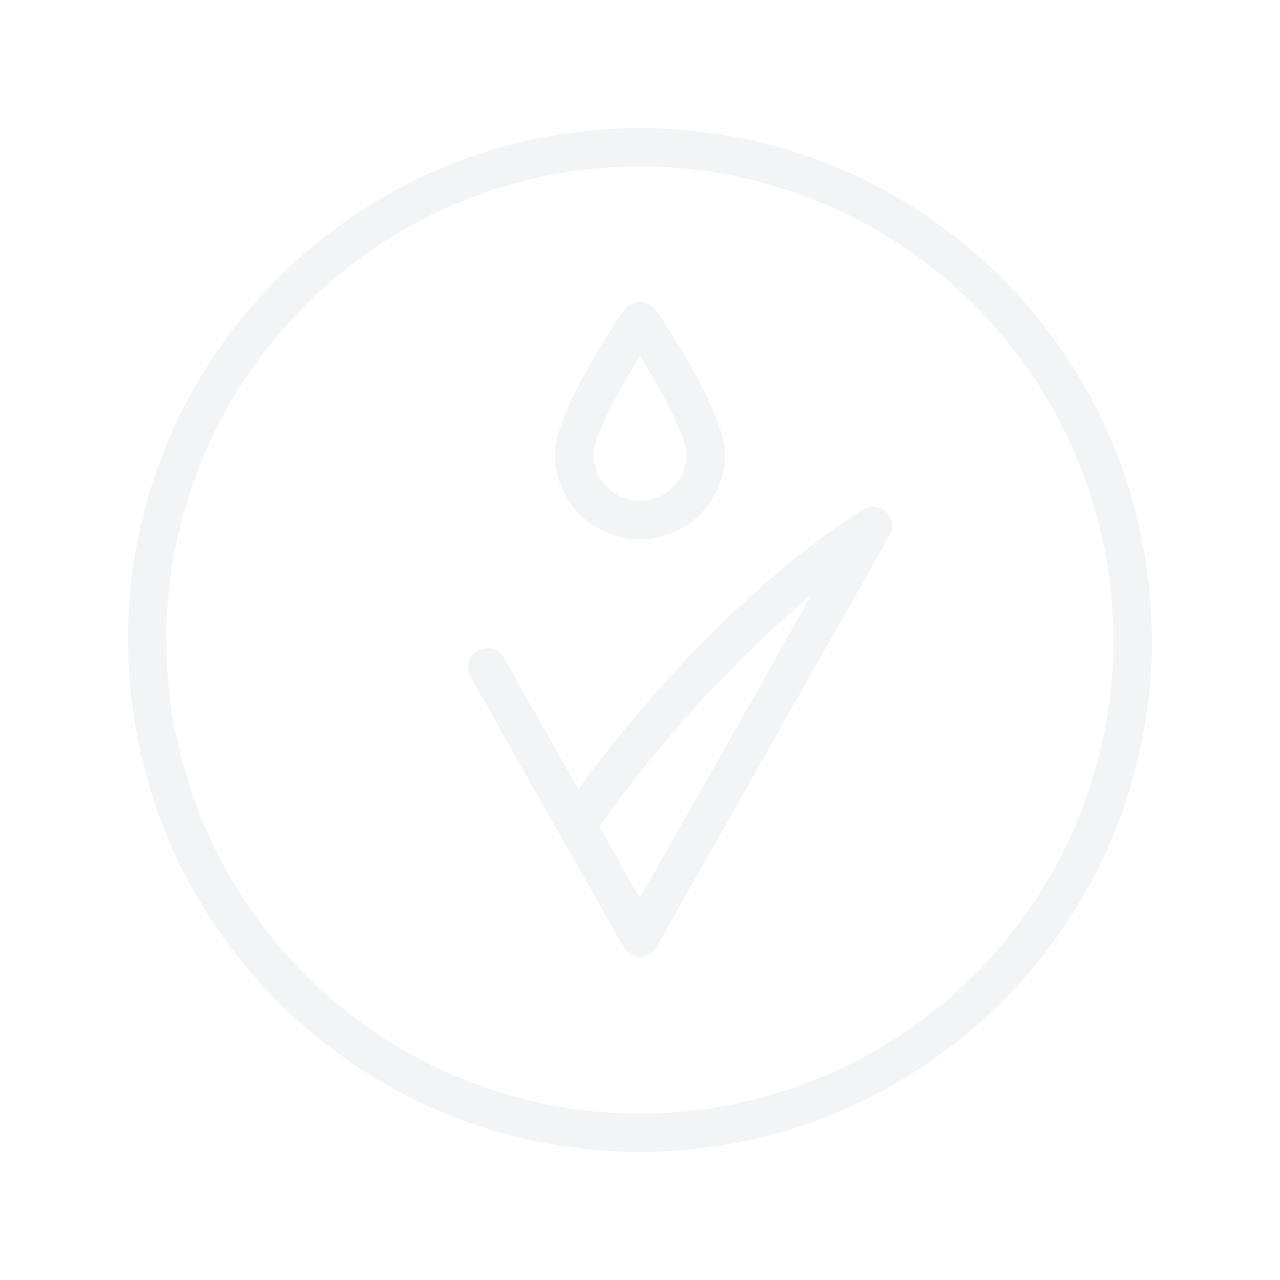 CARITA Ideal Controle Powder Mask 50ml